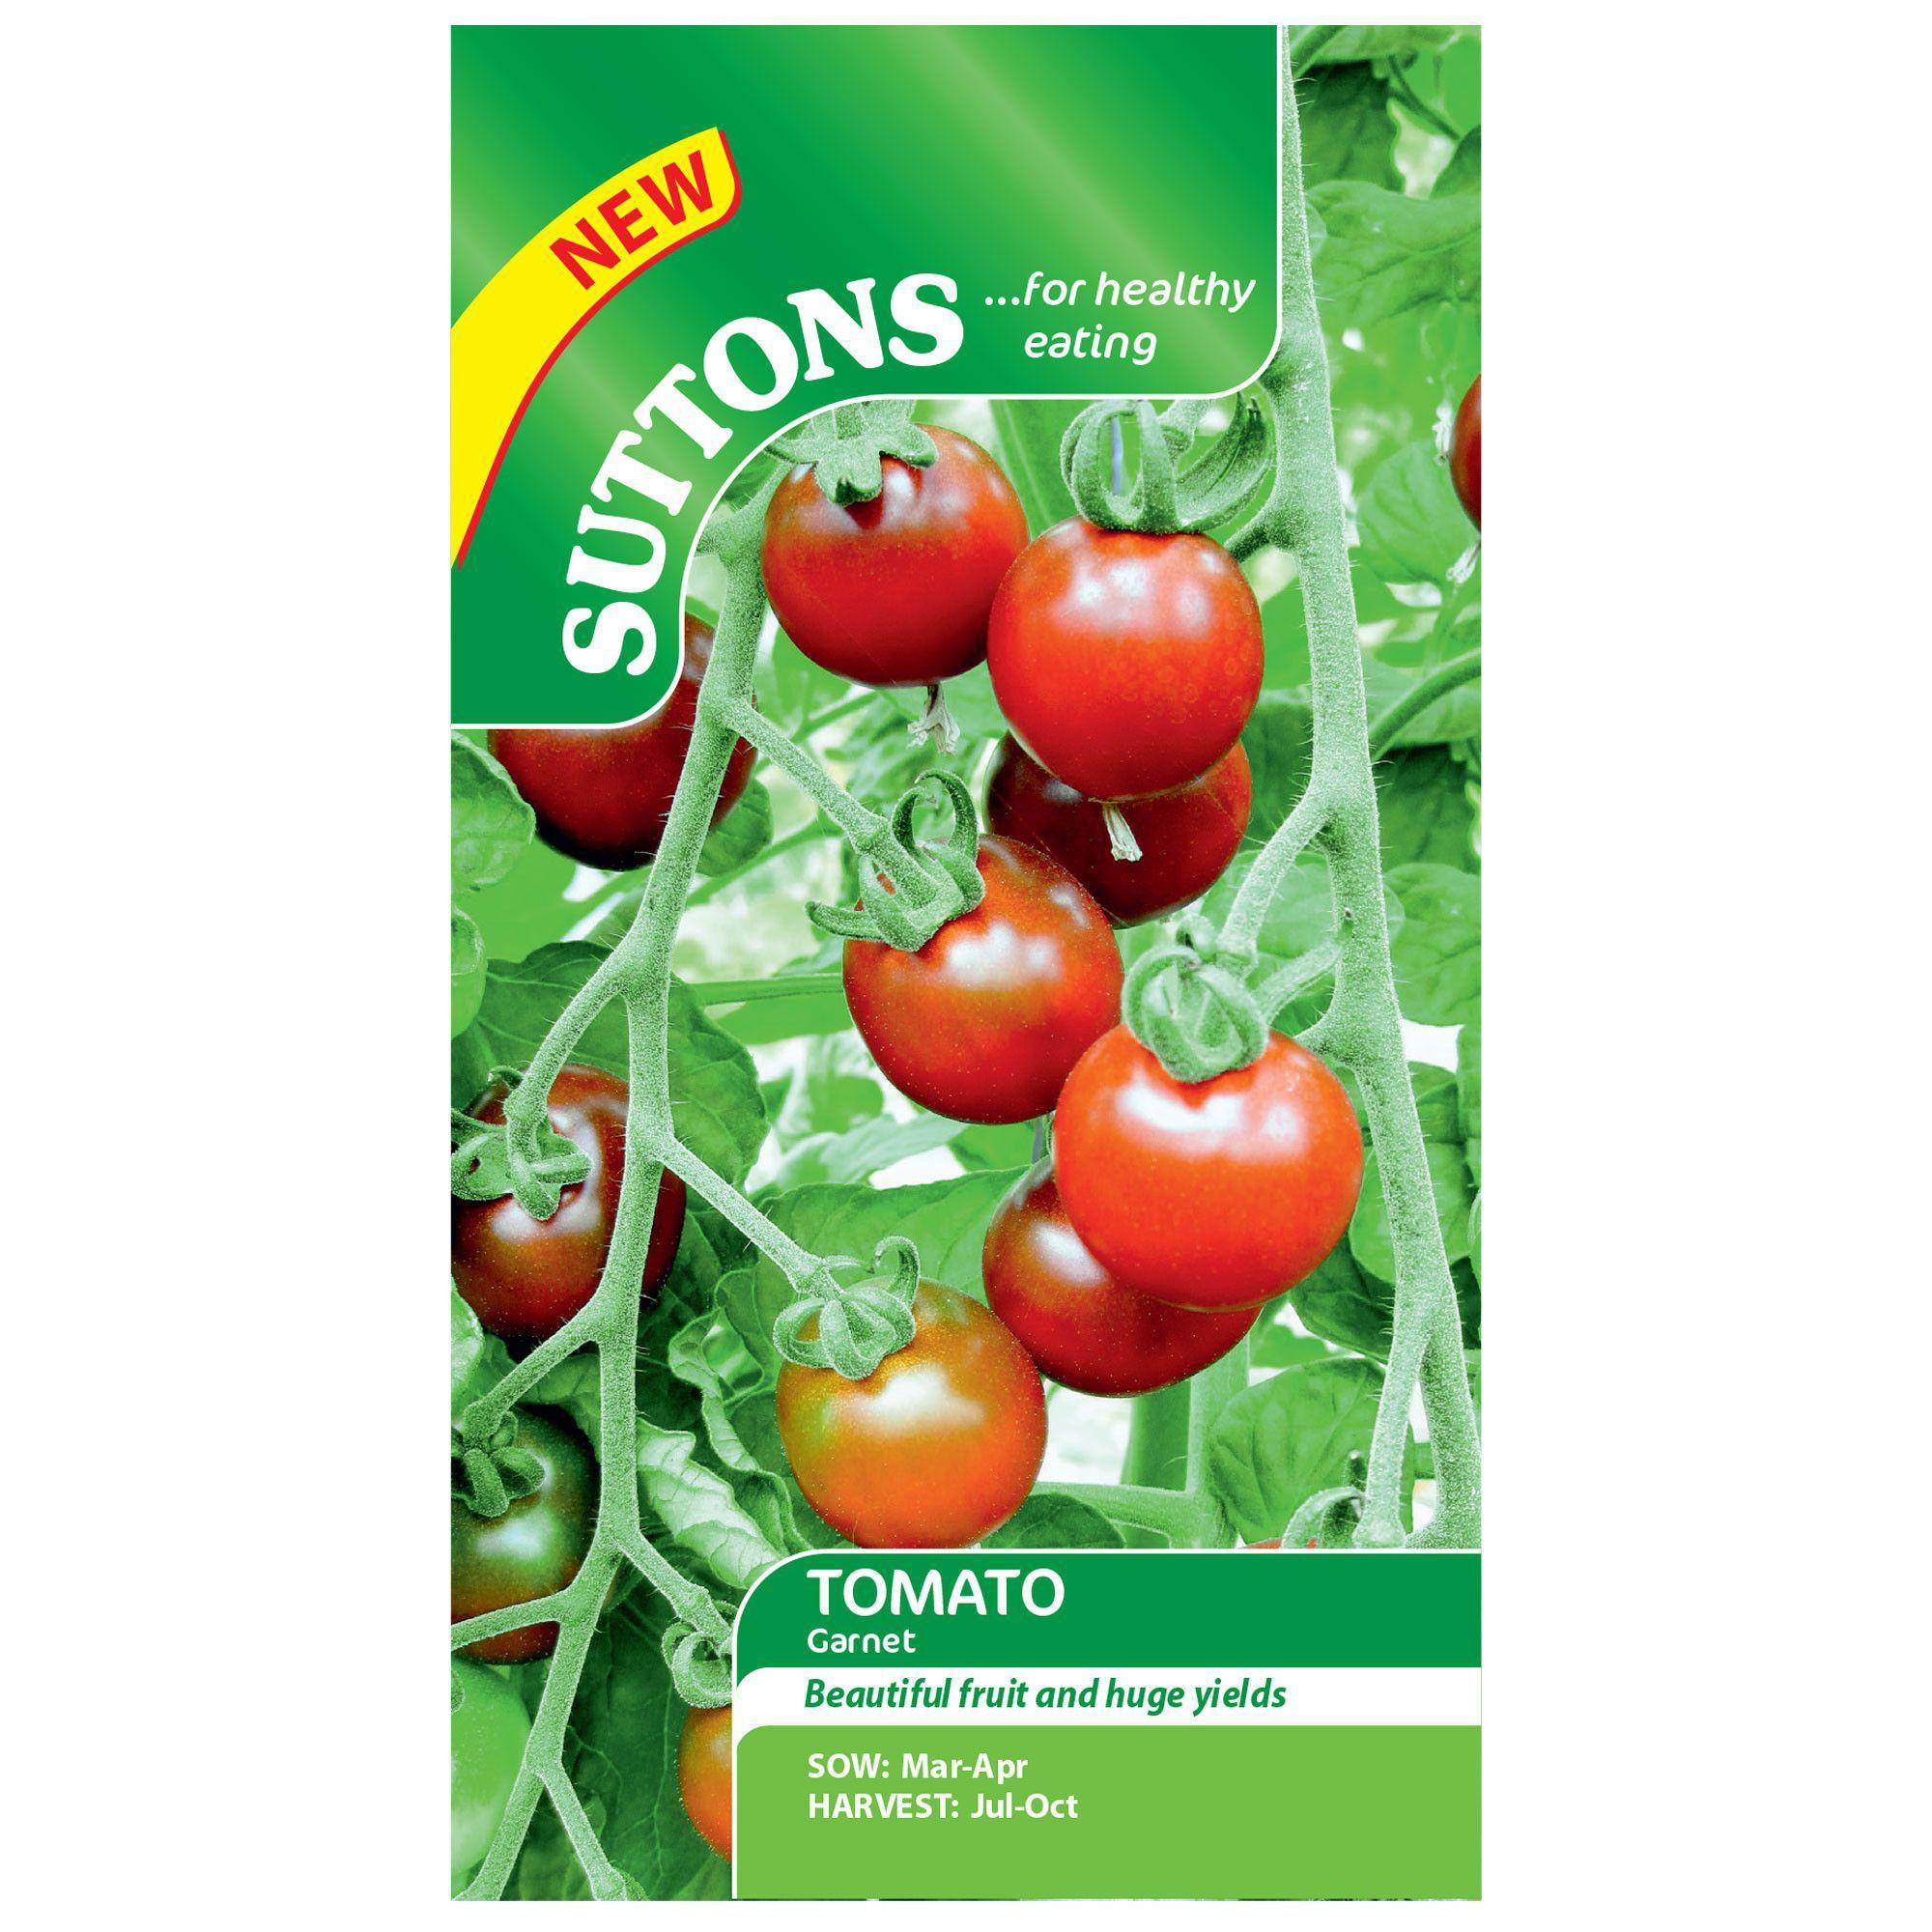 Suttons Tomato Seeds, Garnet